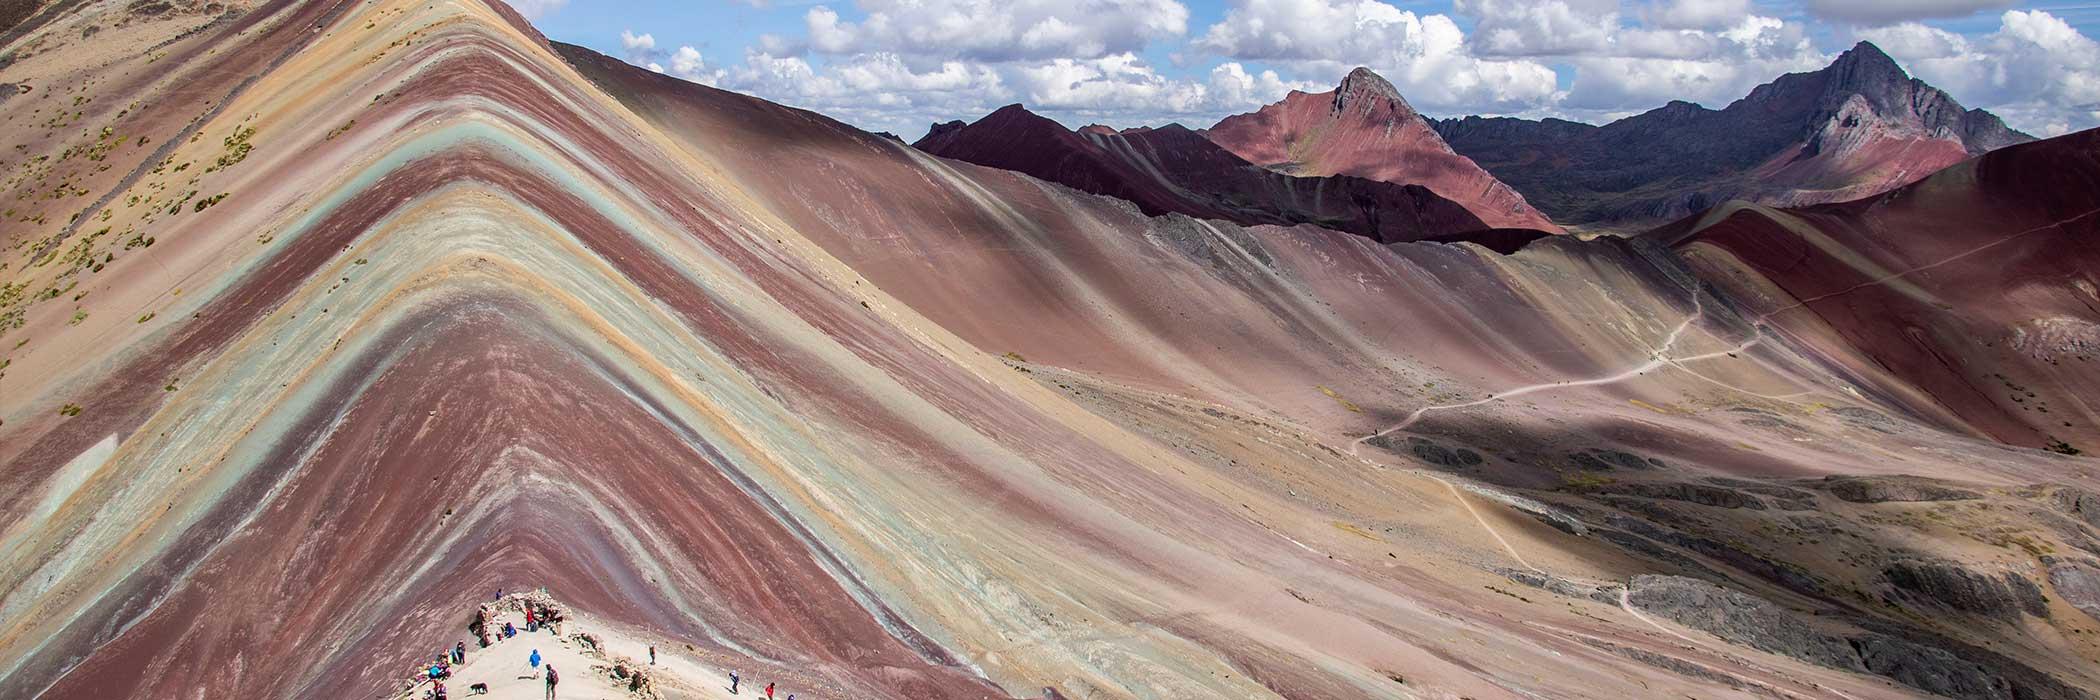 rainbow-mountain-peru-trek